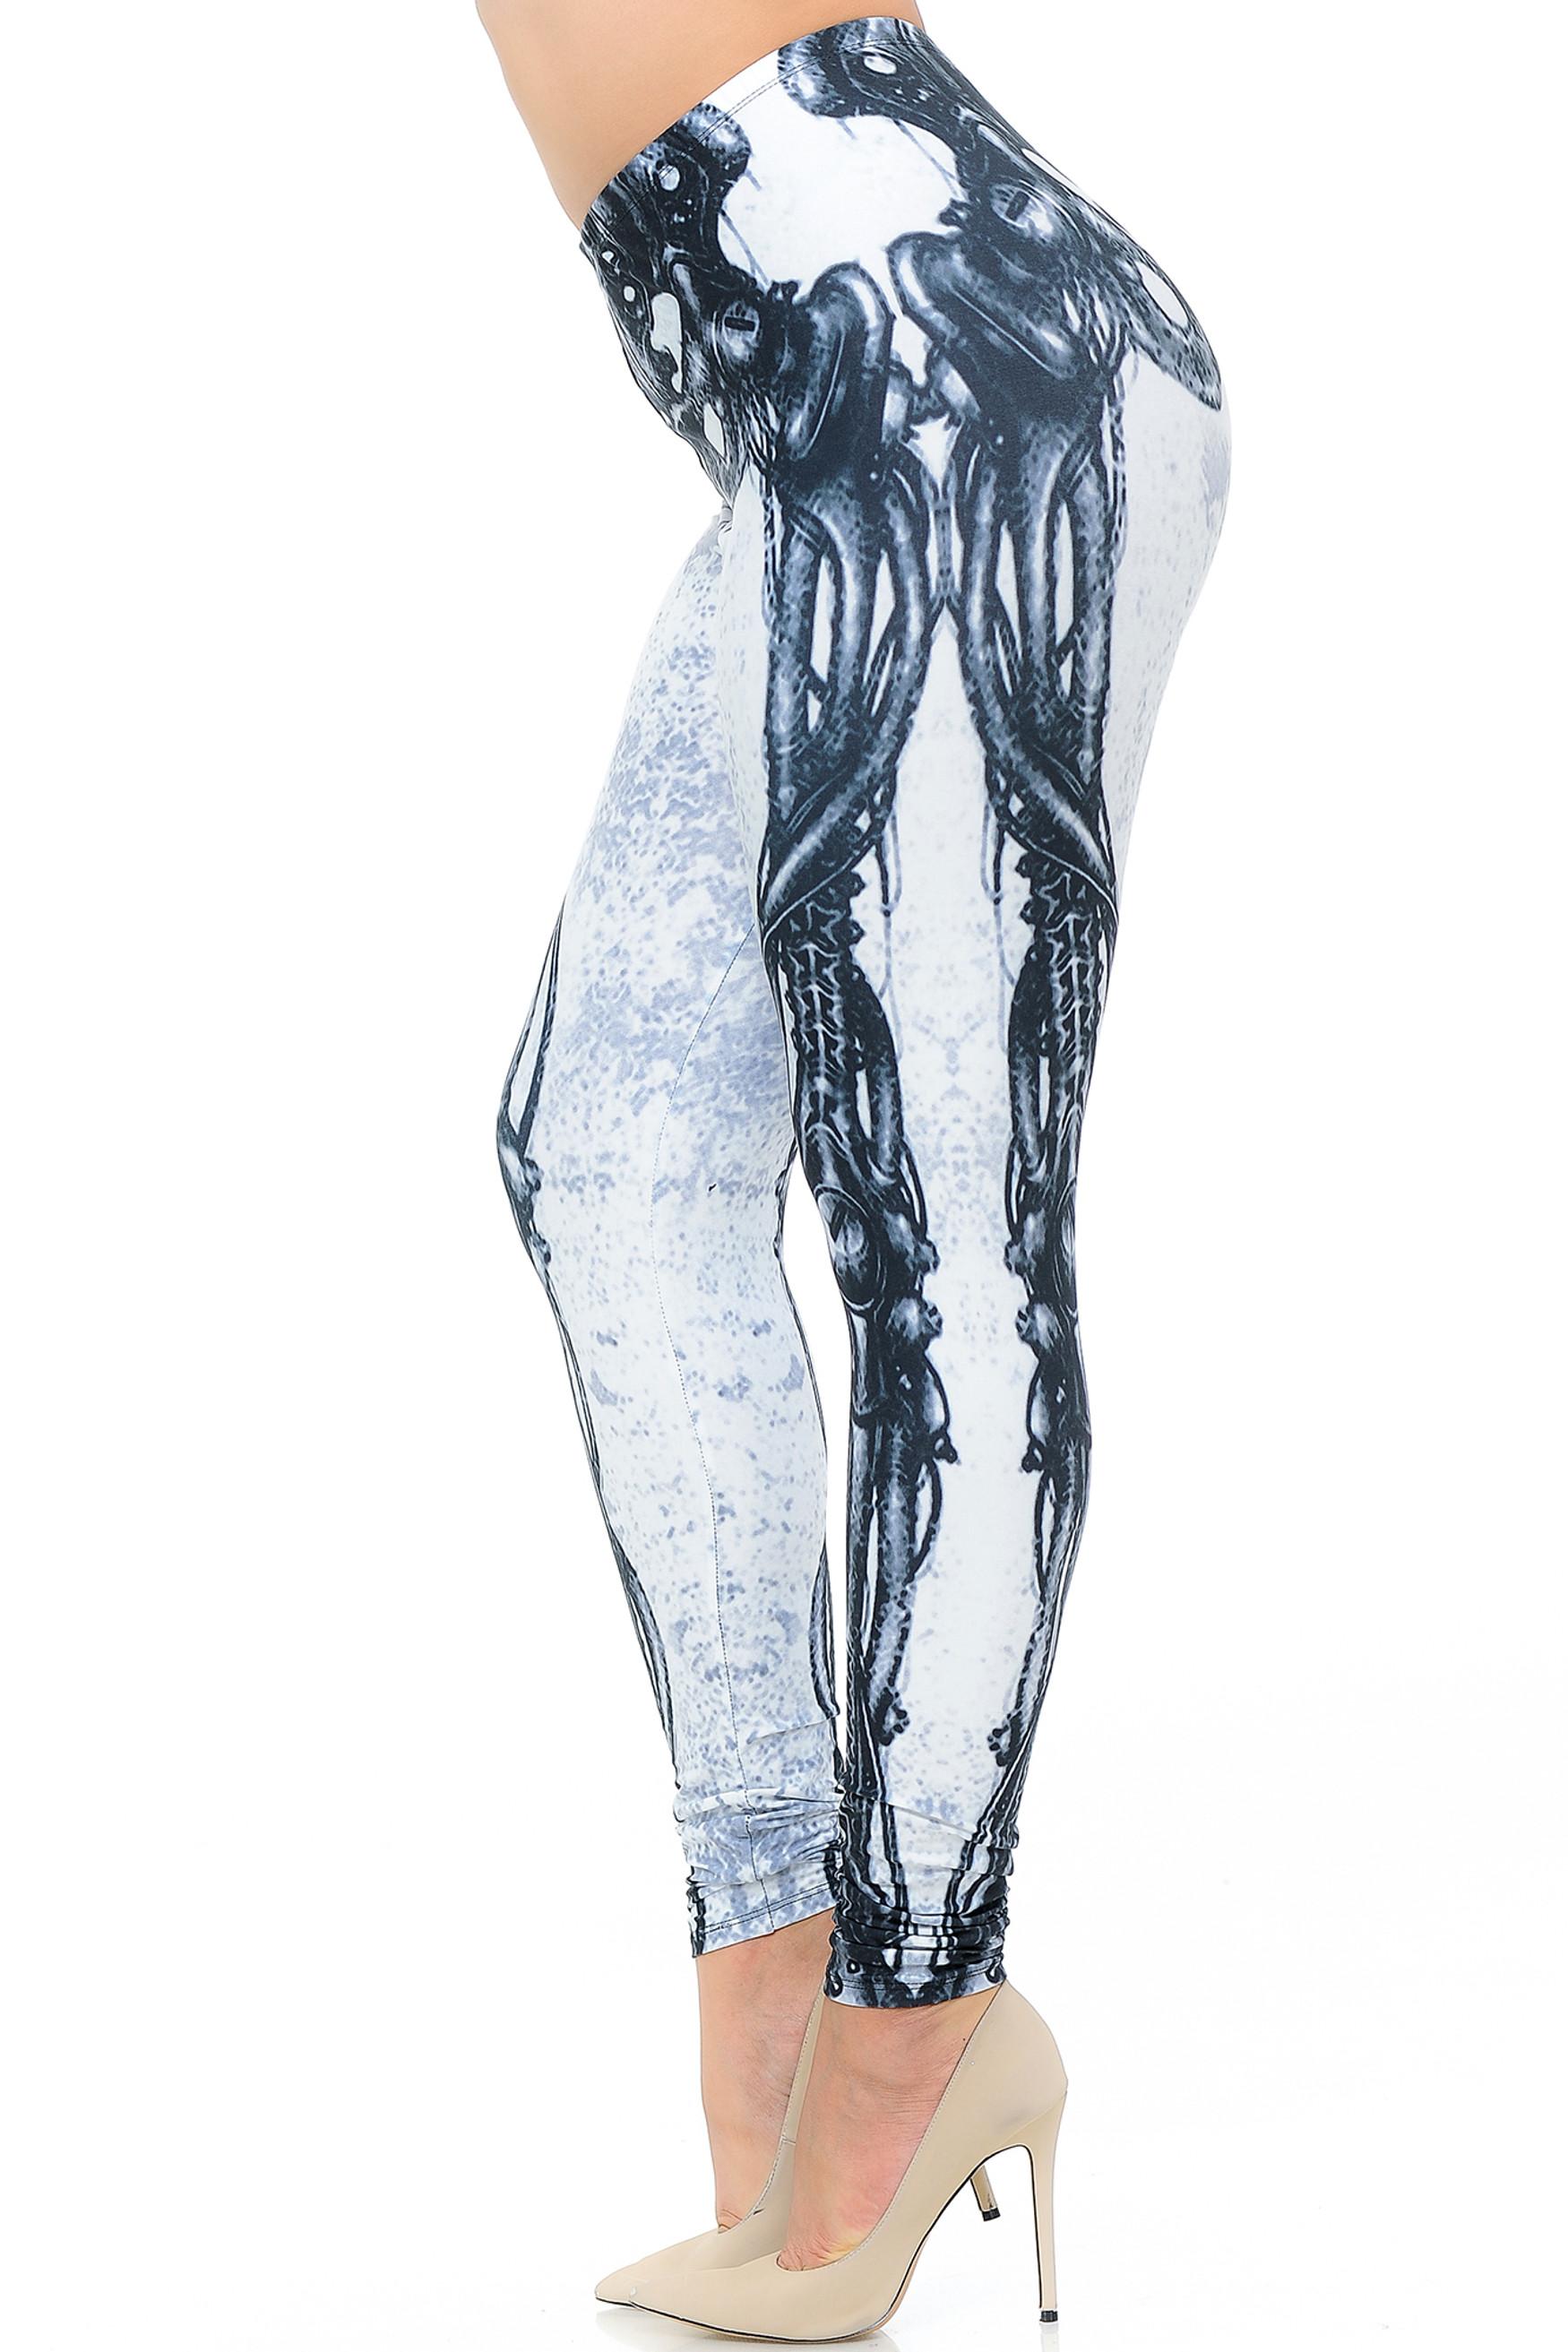 Creamy Soft White Bio Mechanical Skeleton Plus Size Leggings (Steam Punk) - USA Fashion™